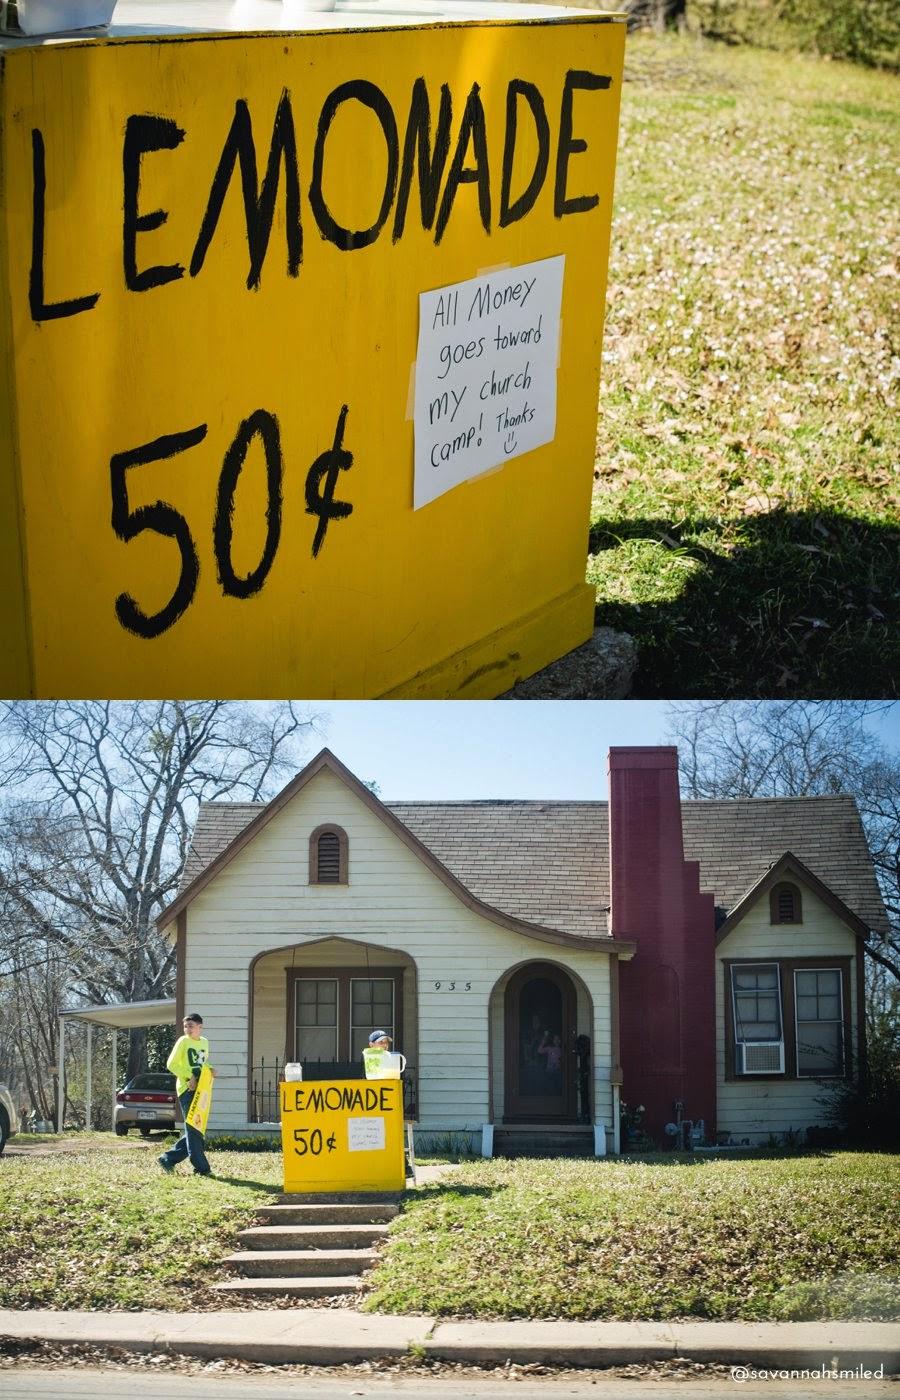 sulphur-springs-texas-lemonade-stand-photo.jpg